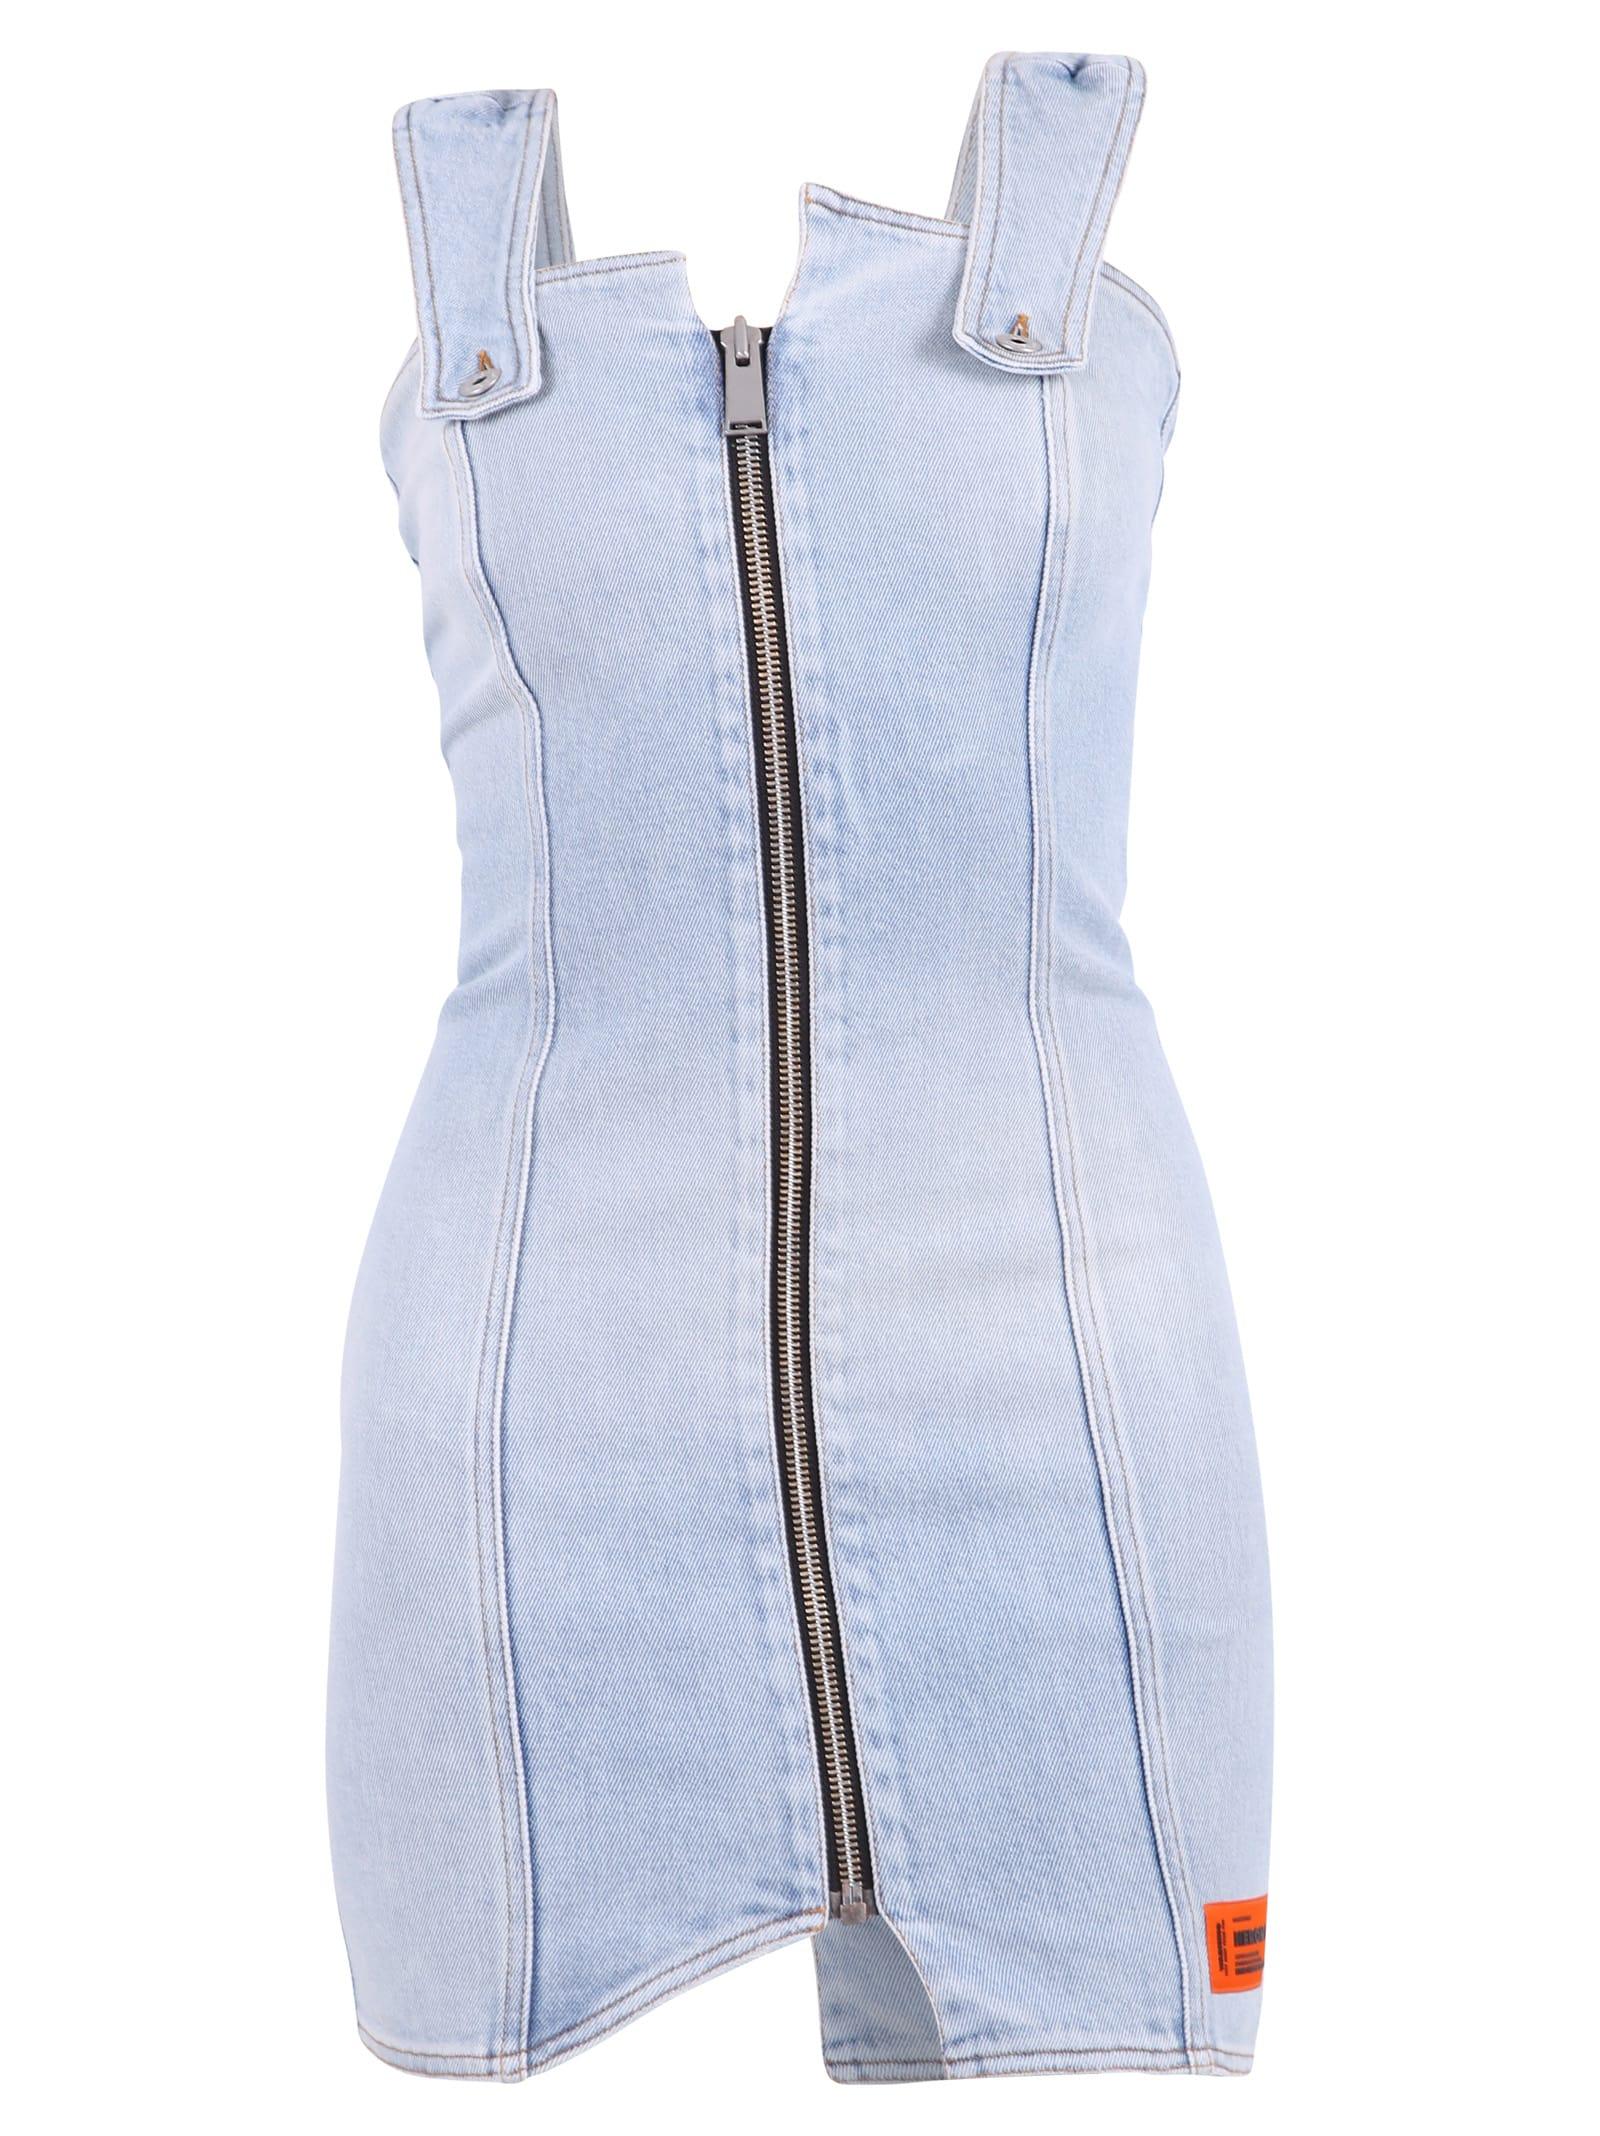 Buy HERON PRESTON Zipped Dress online, shop HERON PRESTON with free shipping